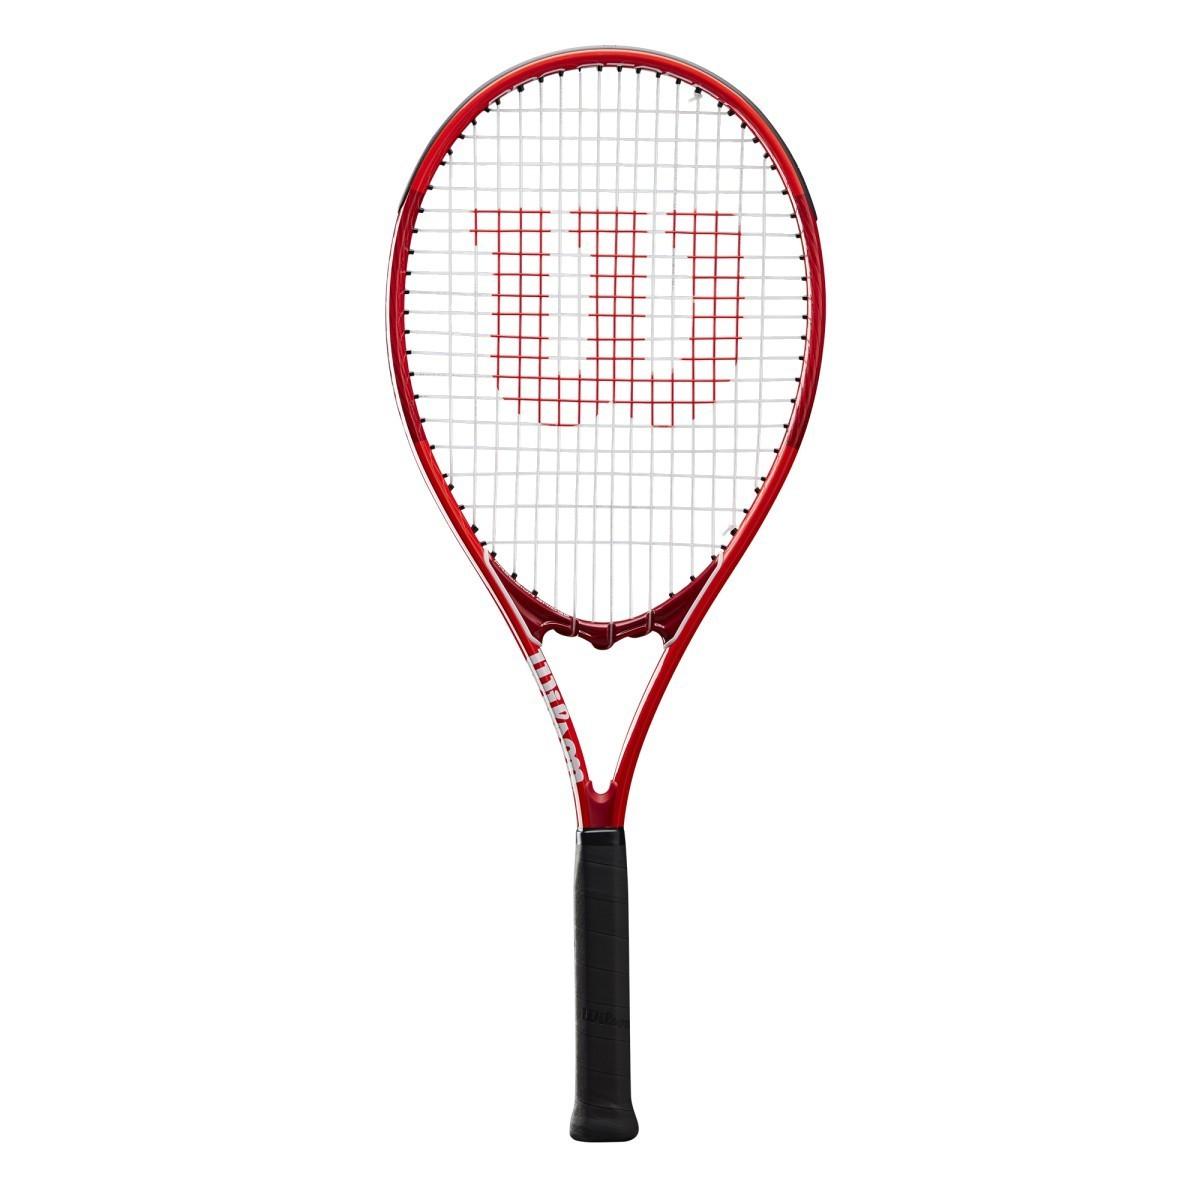 Теннисная ракетка Wilson Pro Staff Precision XL 110